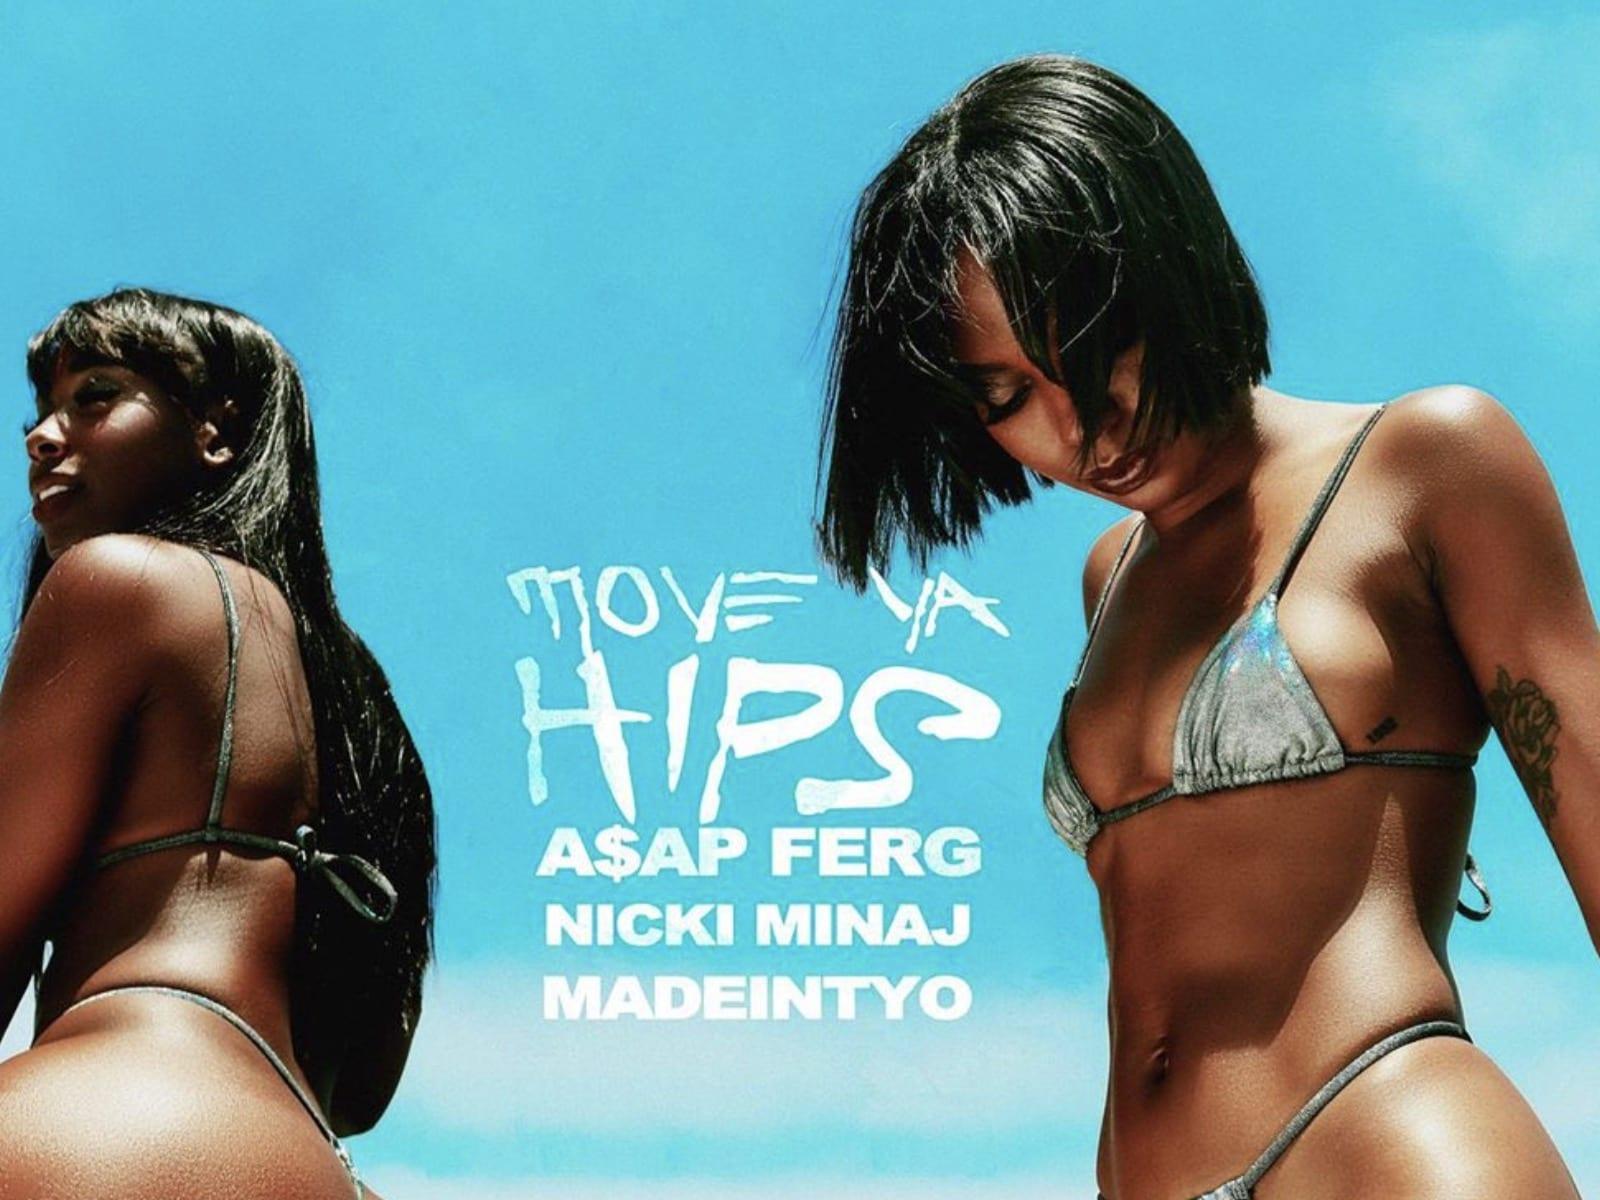 Move Ya Hips Nicki Minaj MadeinTYO A$AP Ferg